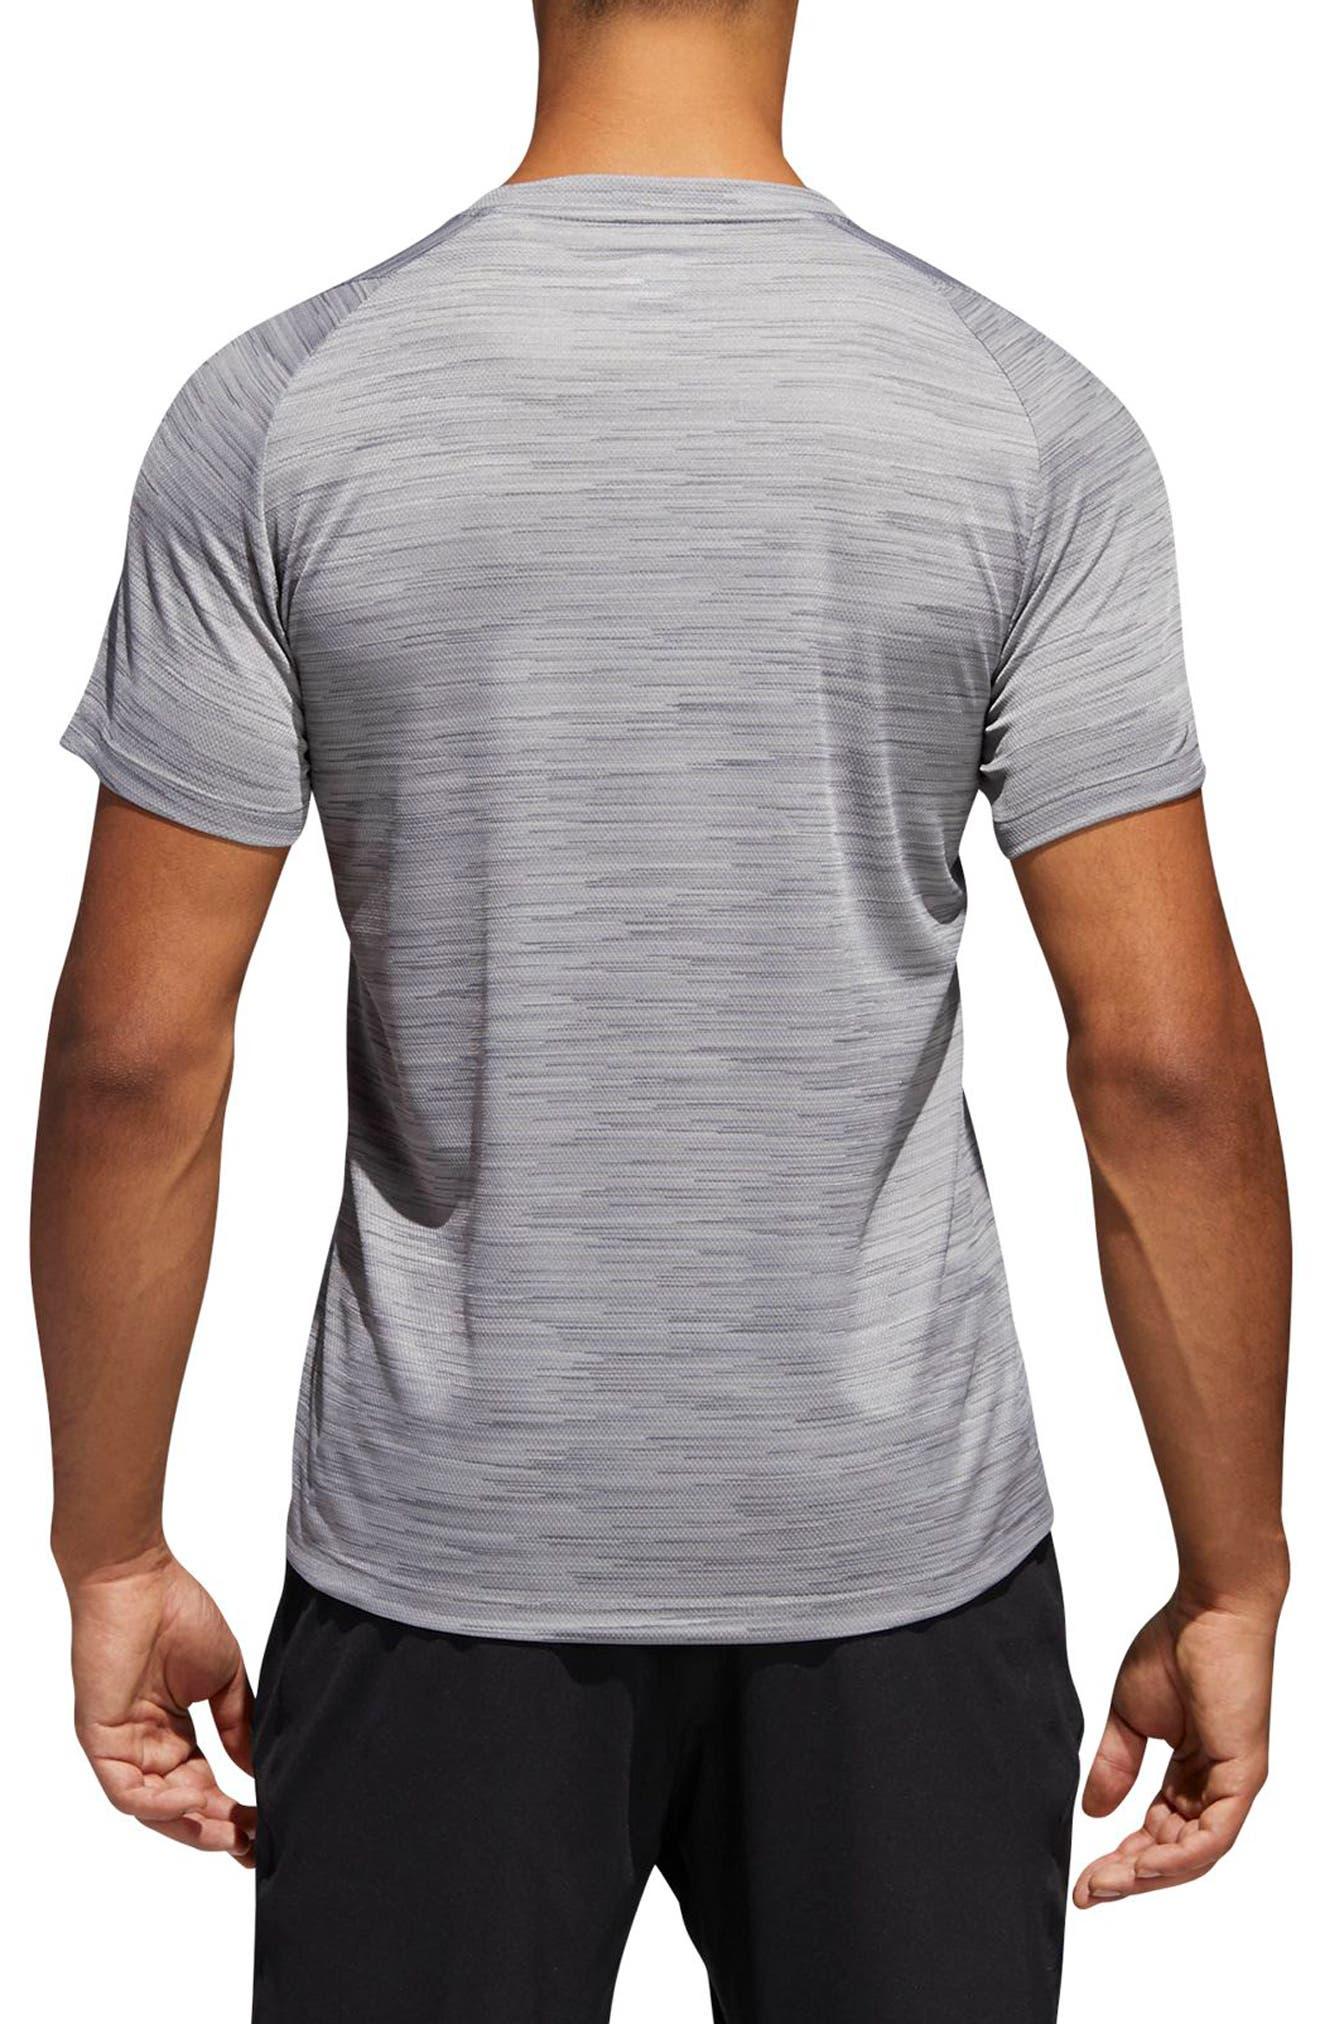 Ultimate Tech T-Shirt,                             Alternate thumbnail 2, color,                             036